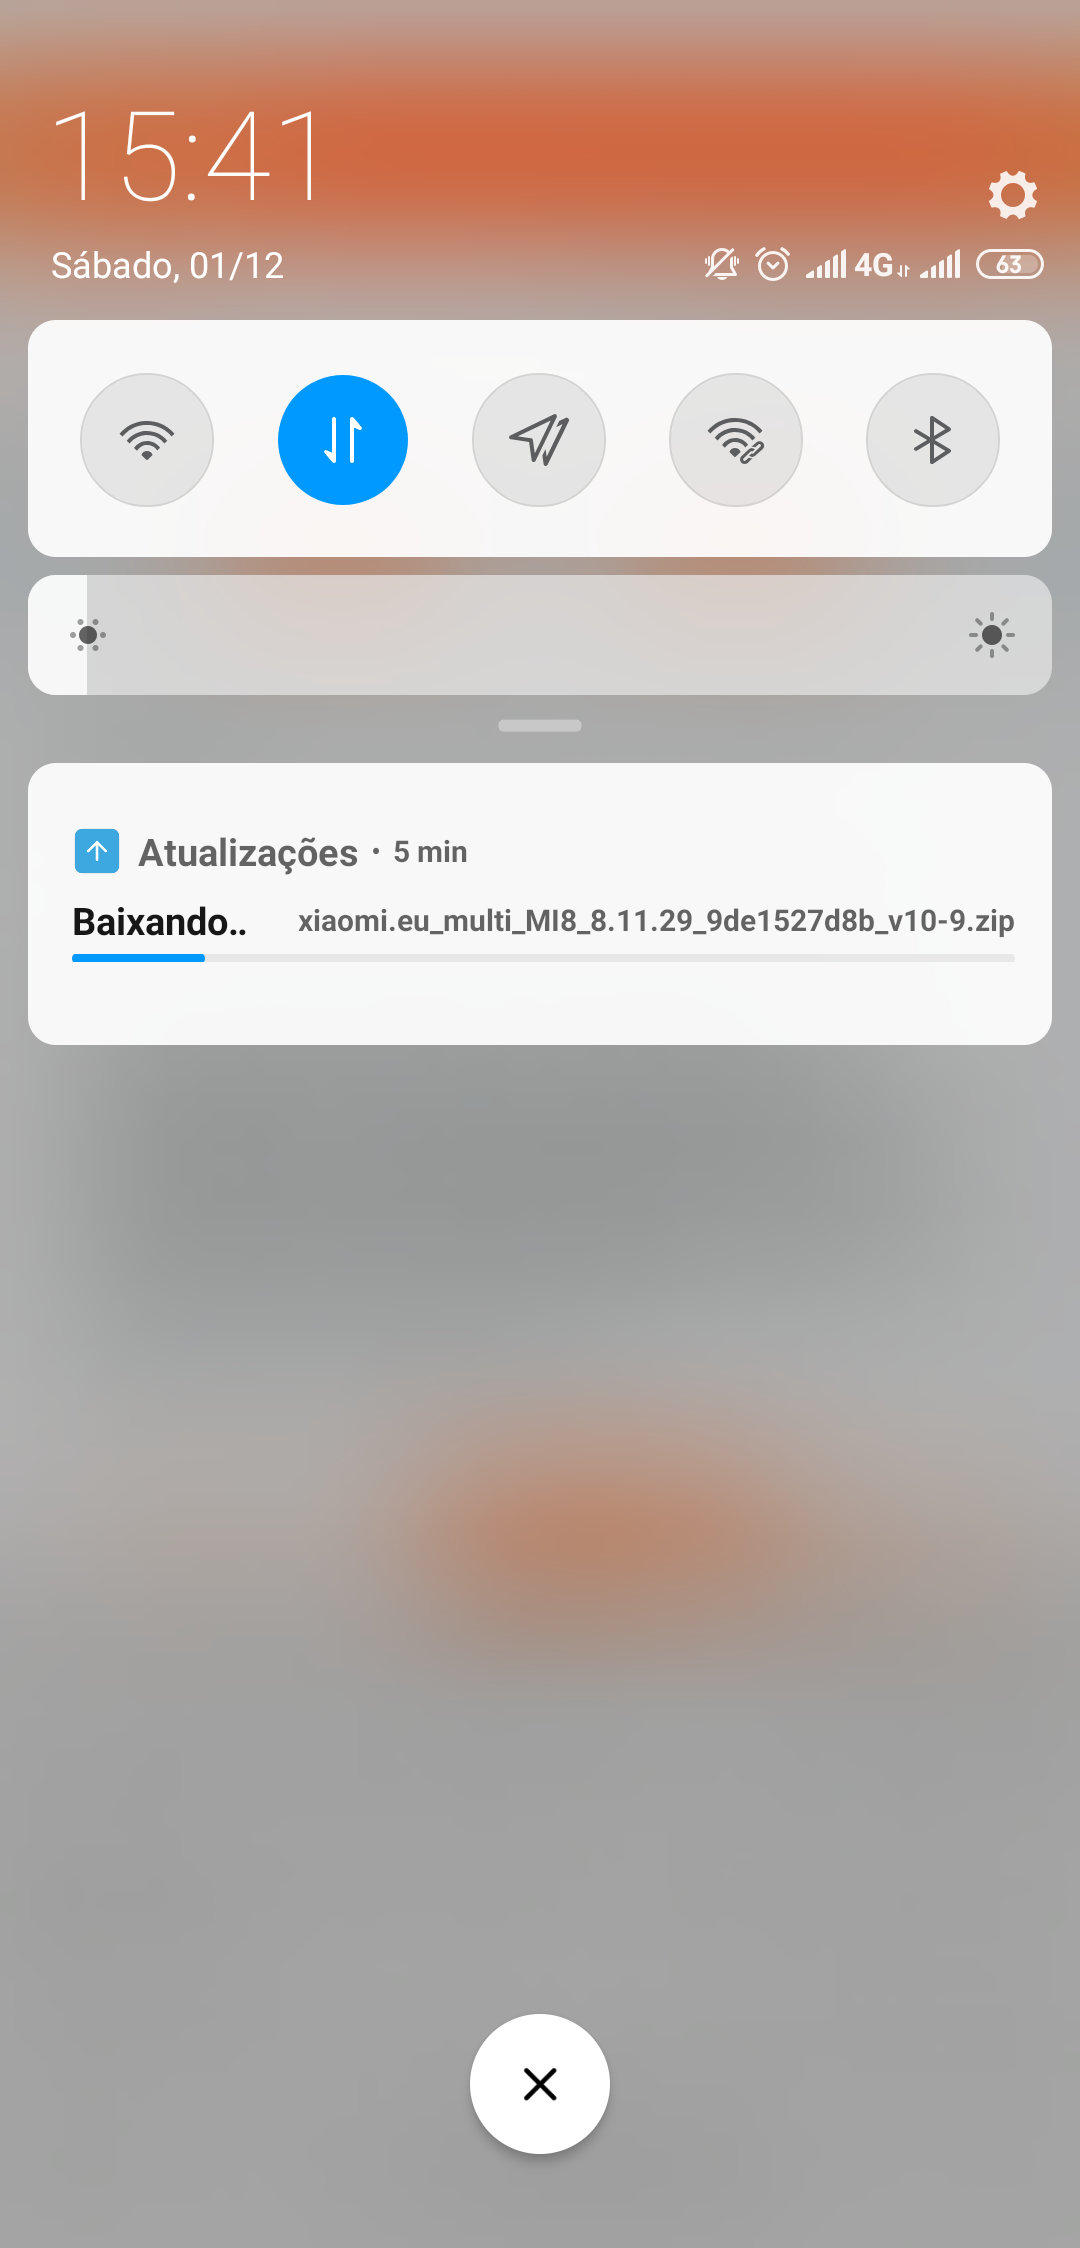 Screenshot_2018-12-01-15-41-13-381_com.android.browser.png